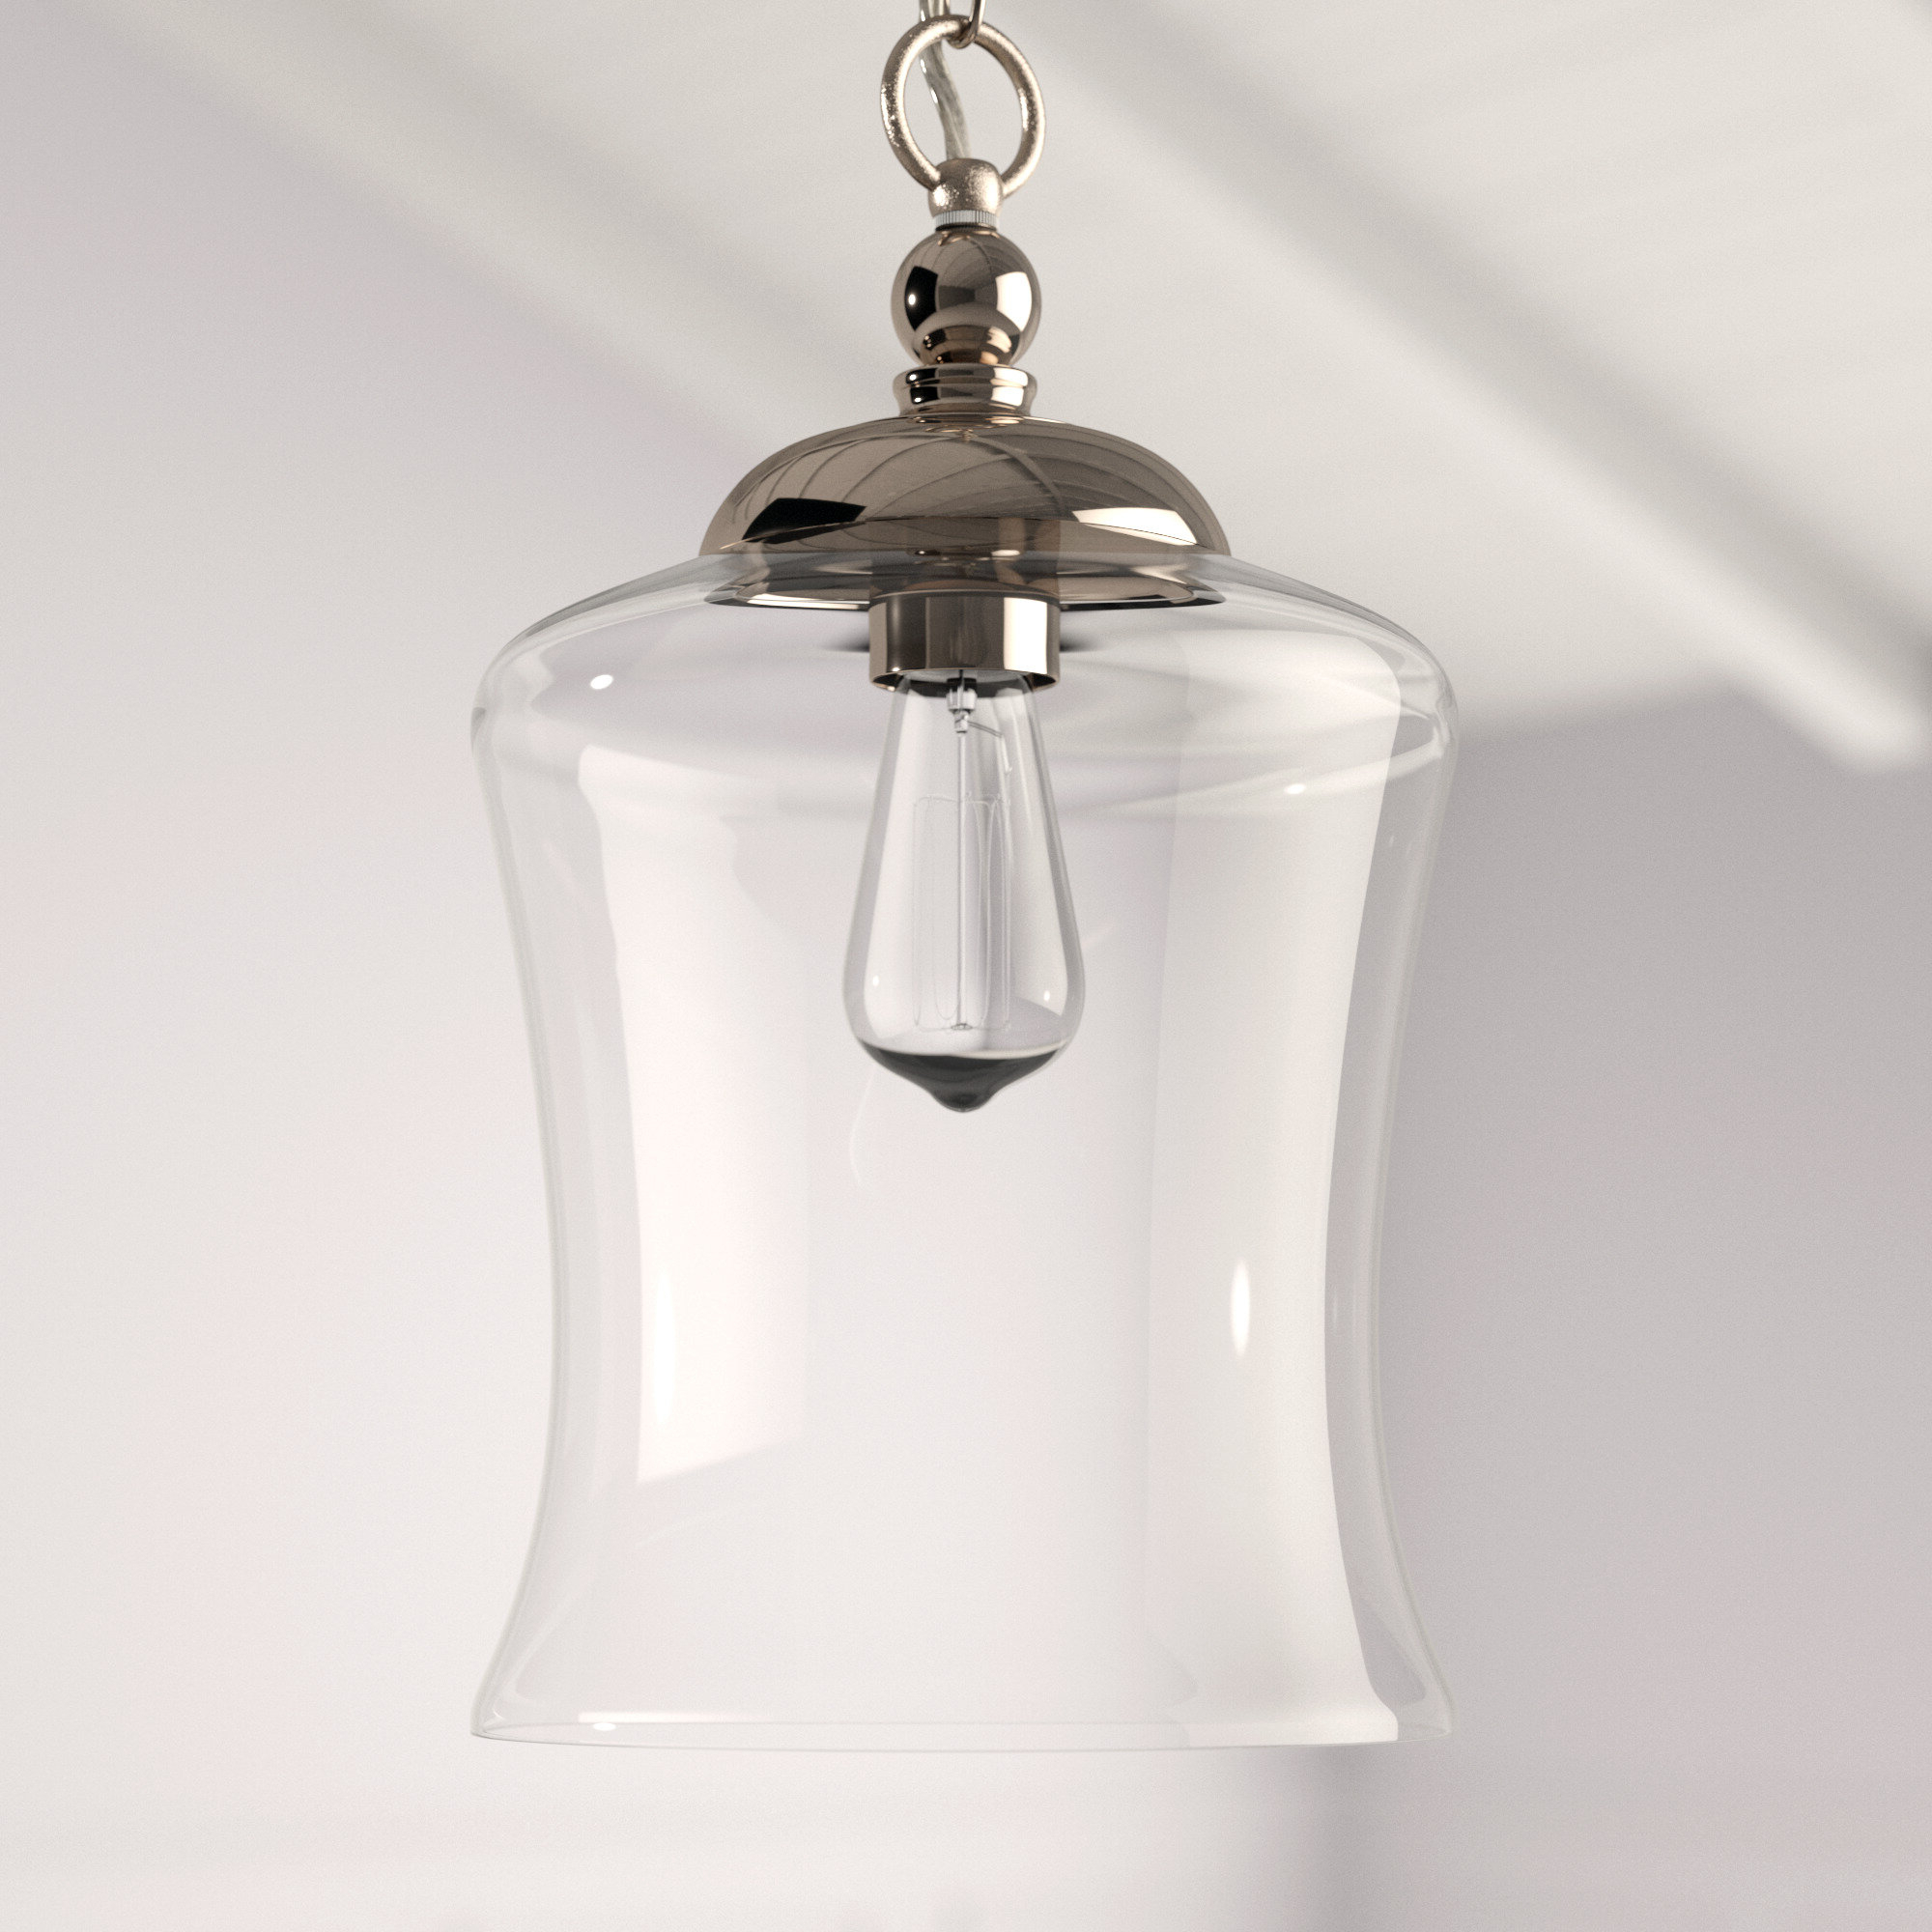 Nolan 1 Light Single Cylinder Pendants Pertaining To Recent Wentzville 1 Light Single Bell Pendant (View 12 of 25)